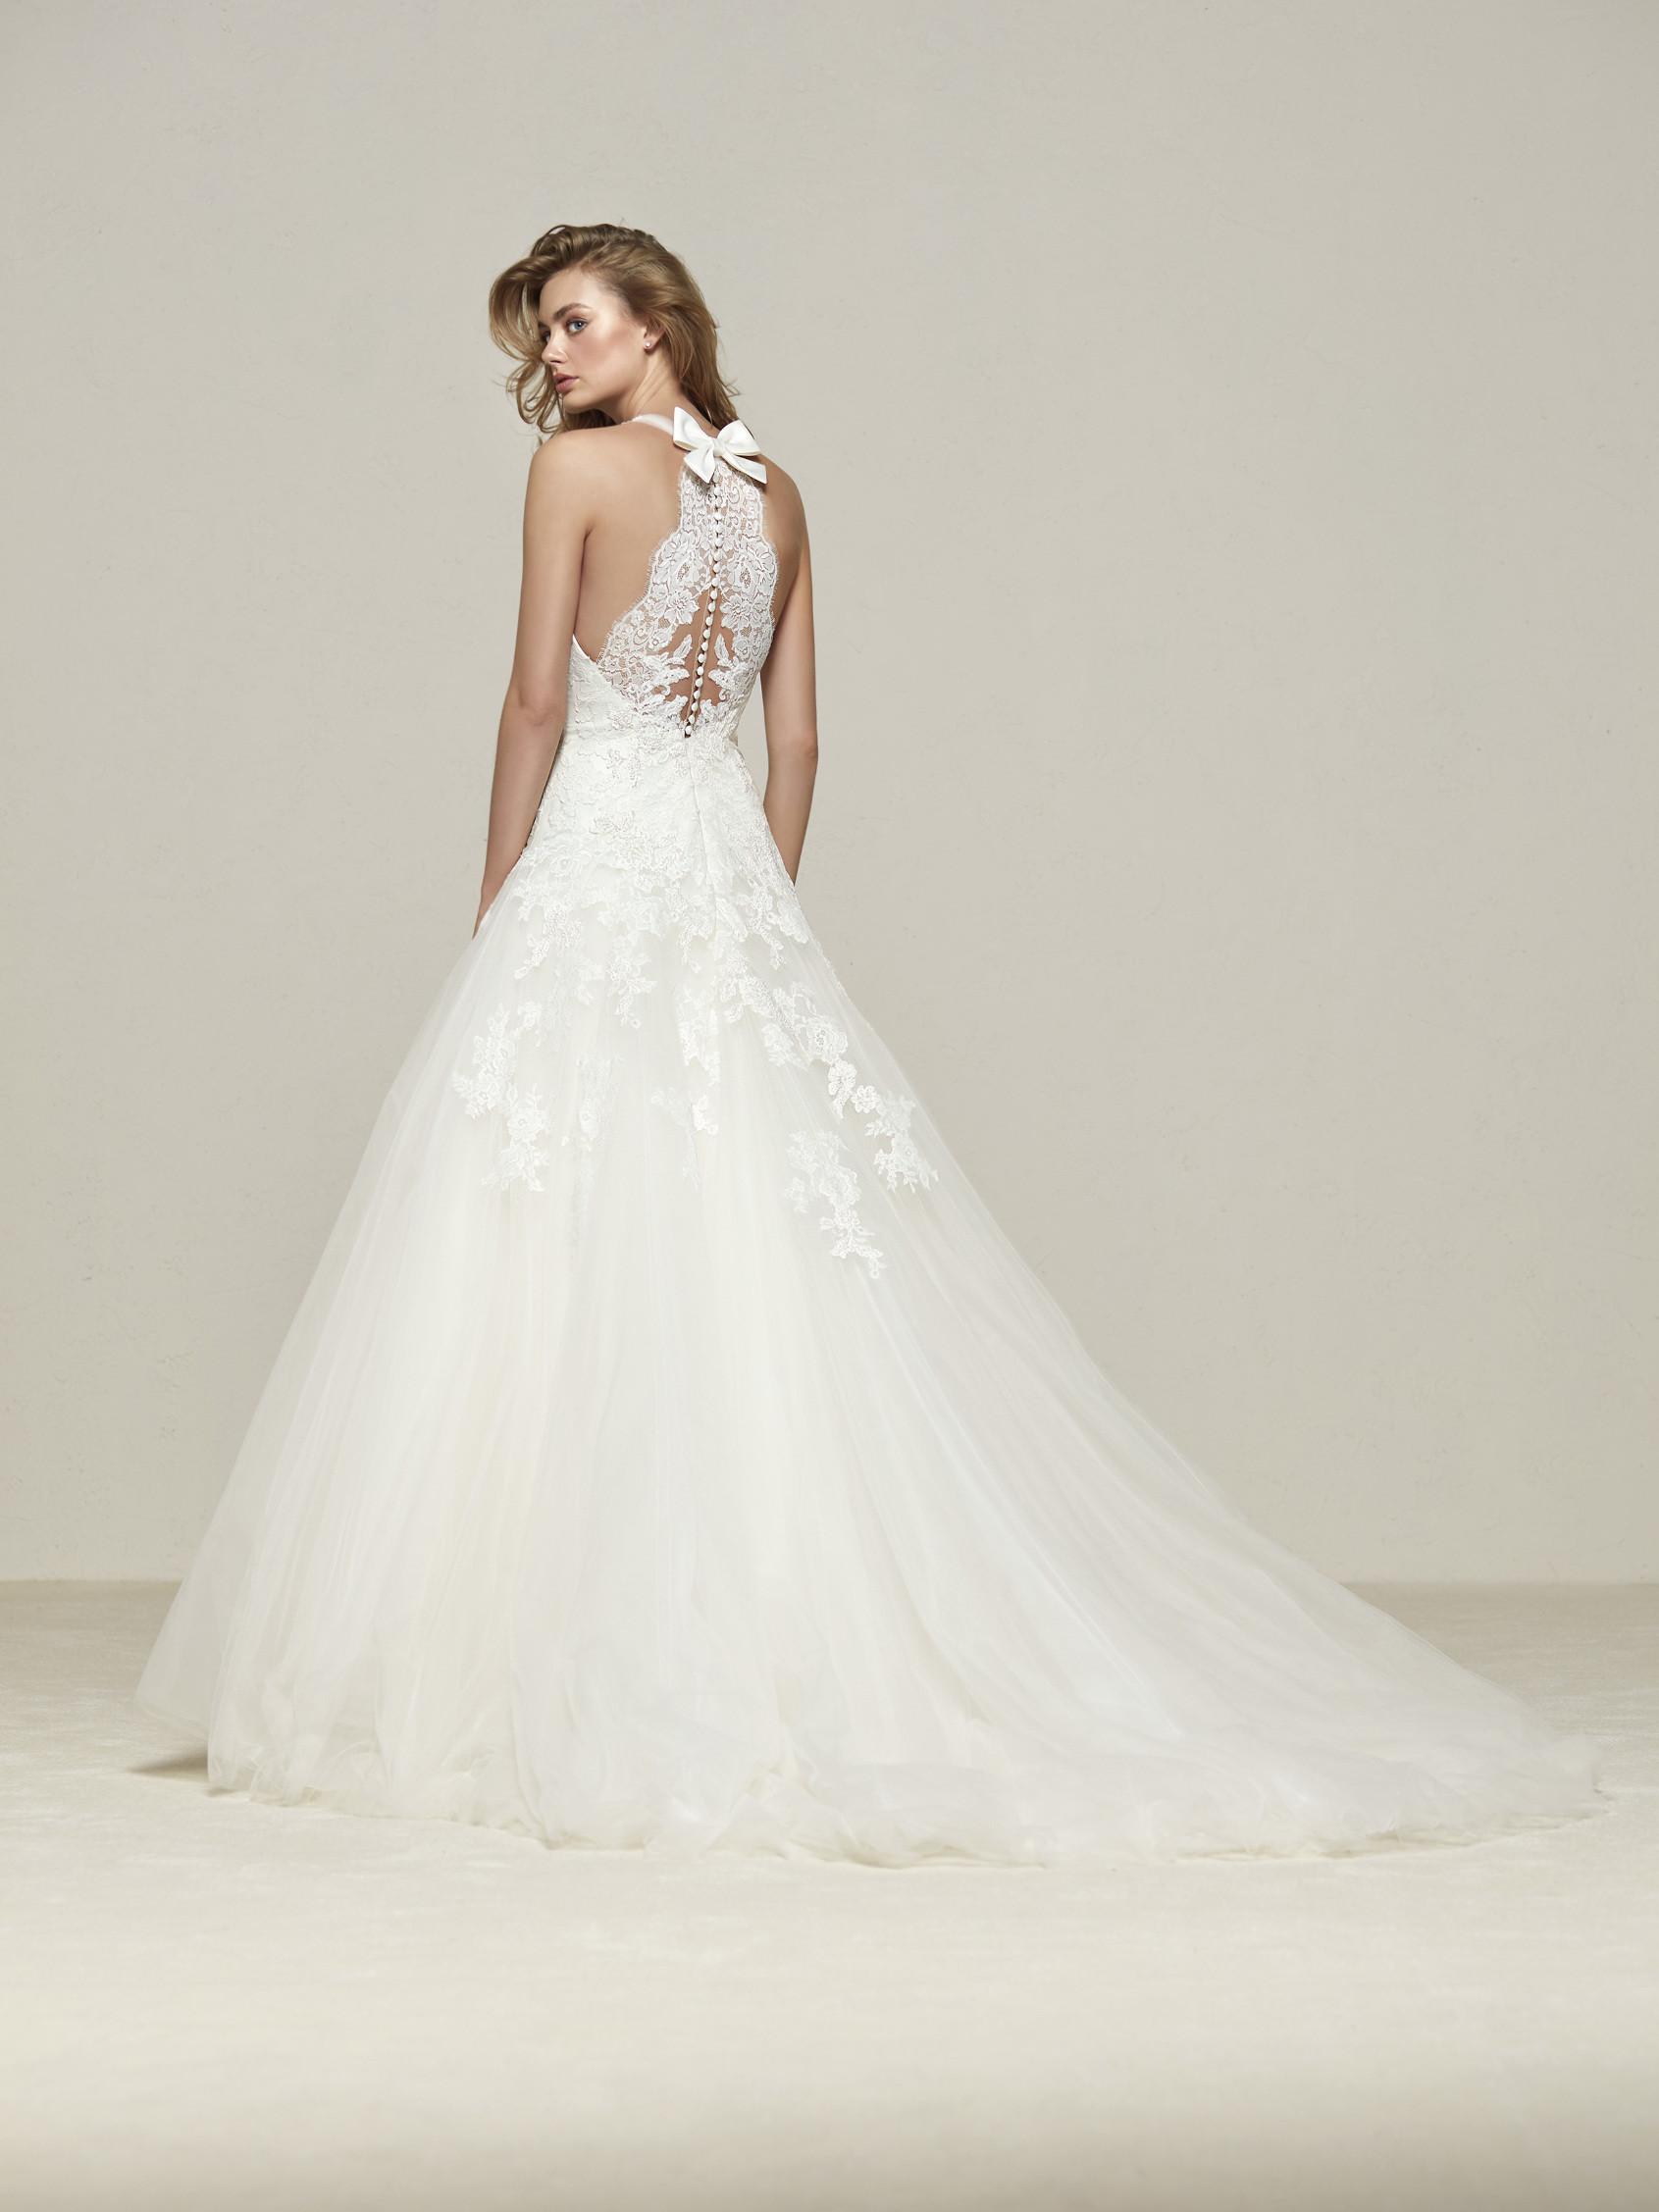 Pronovias drisara wedding dress 2018 collection essex for Pronovias wedding dresses price range